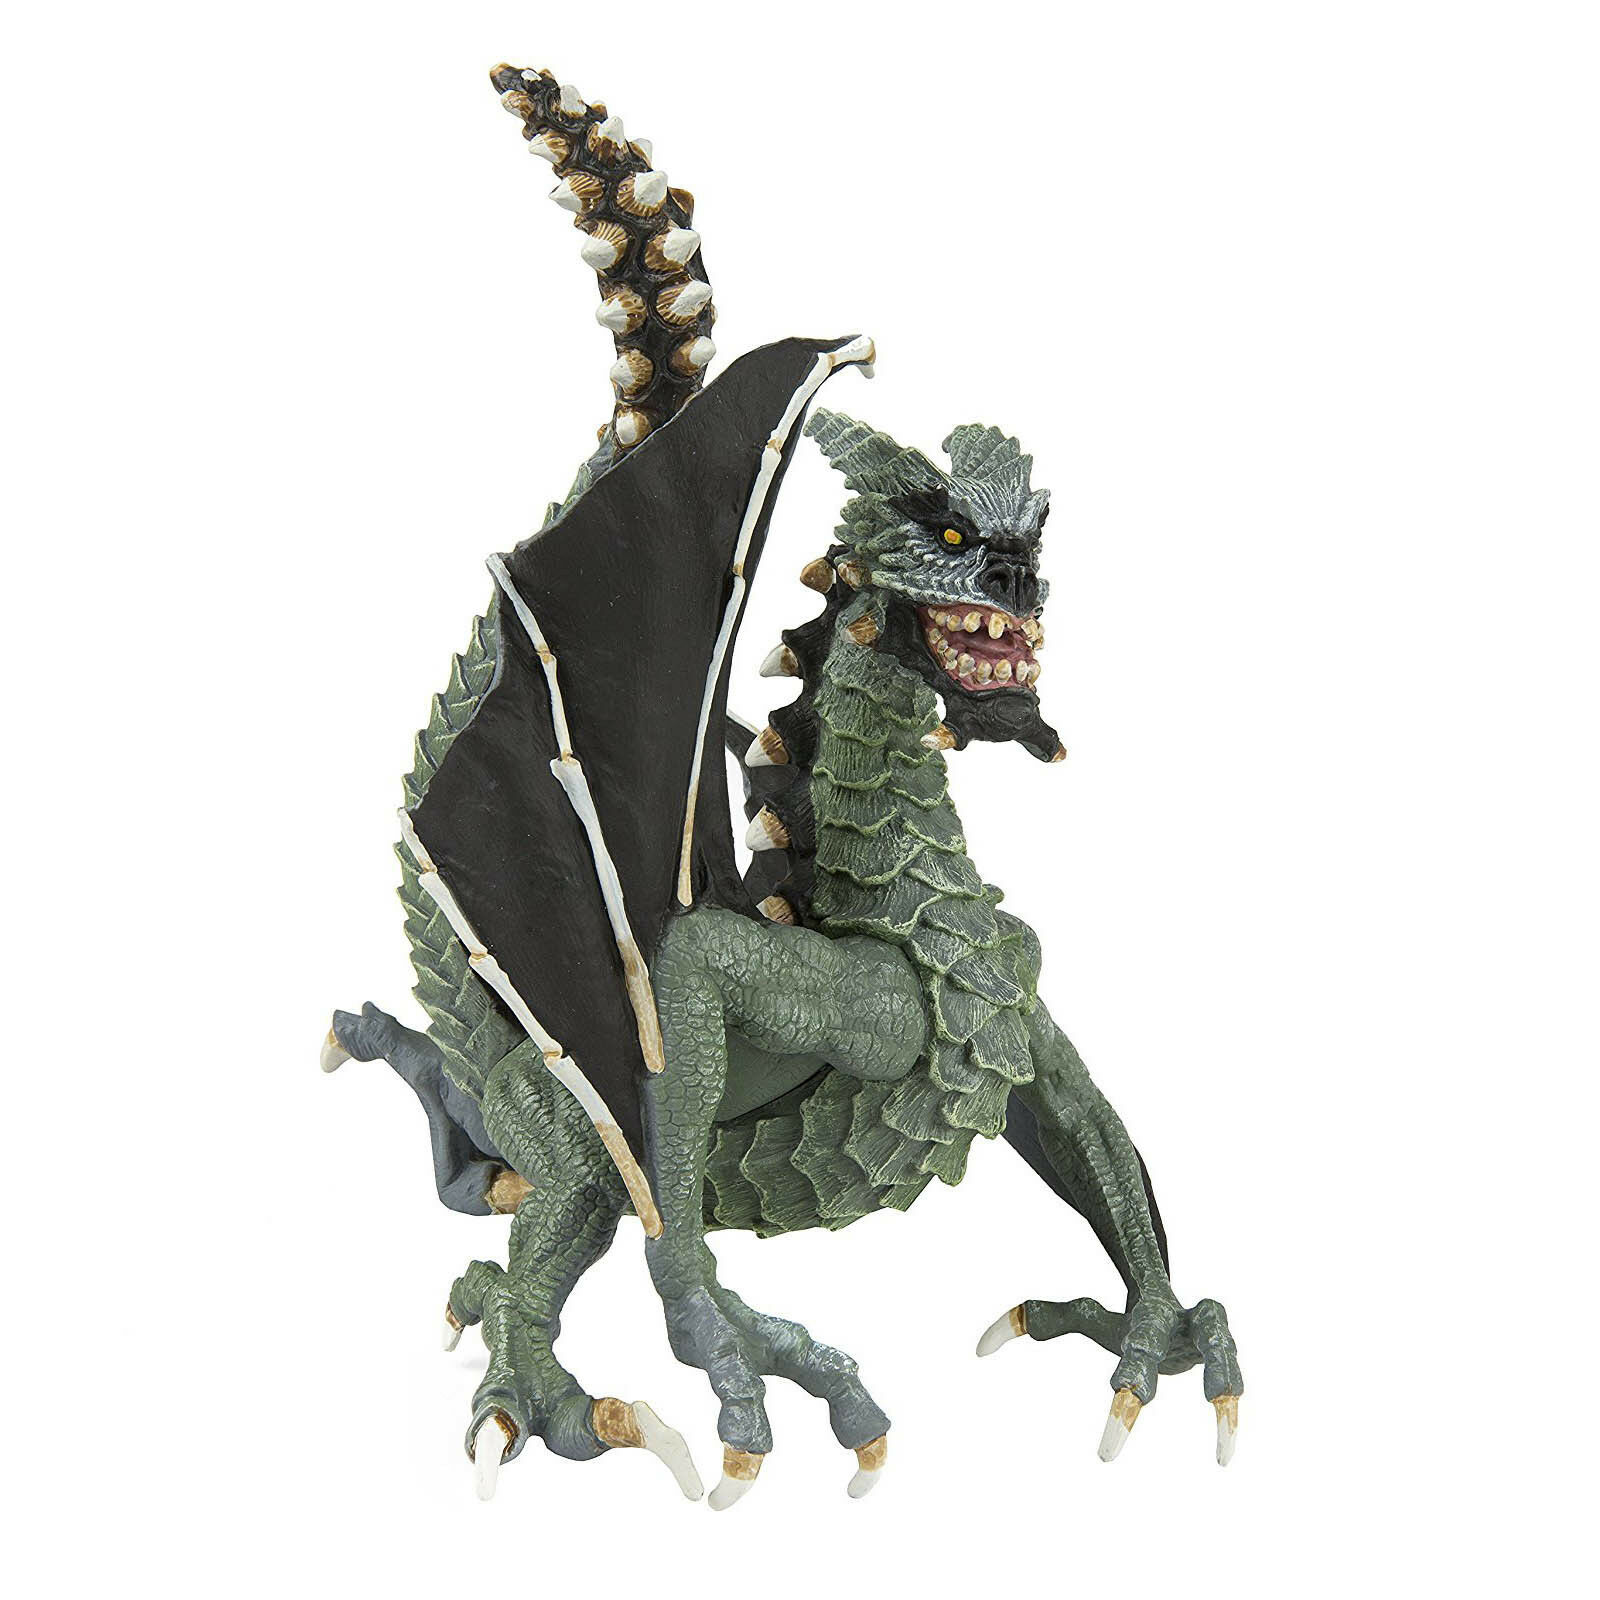 sinister dragon fantasy safari ltd new toys detailed kids collectibles gifts ebay. Black Bedroom Furniture Sets. Home Design Ideas